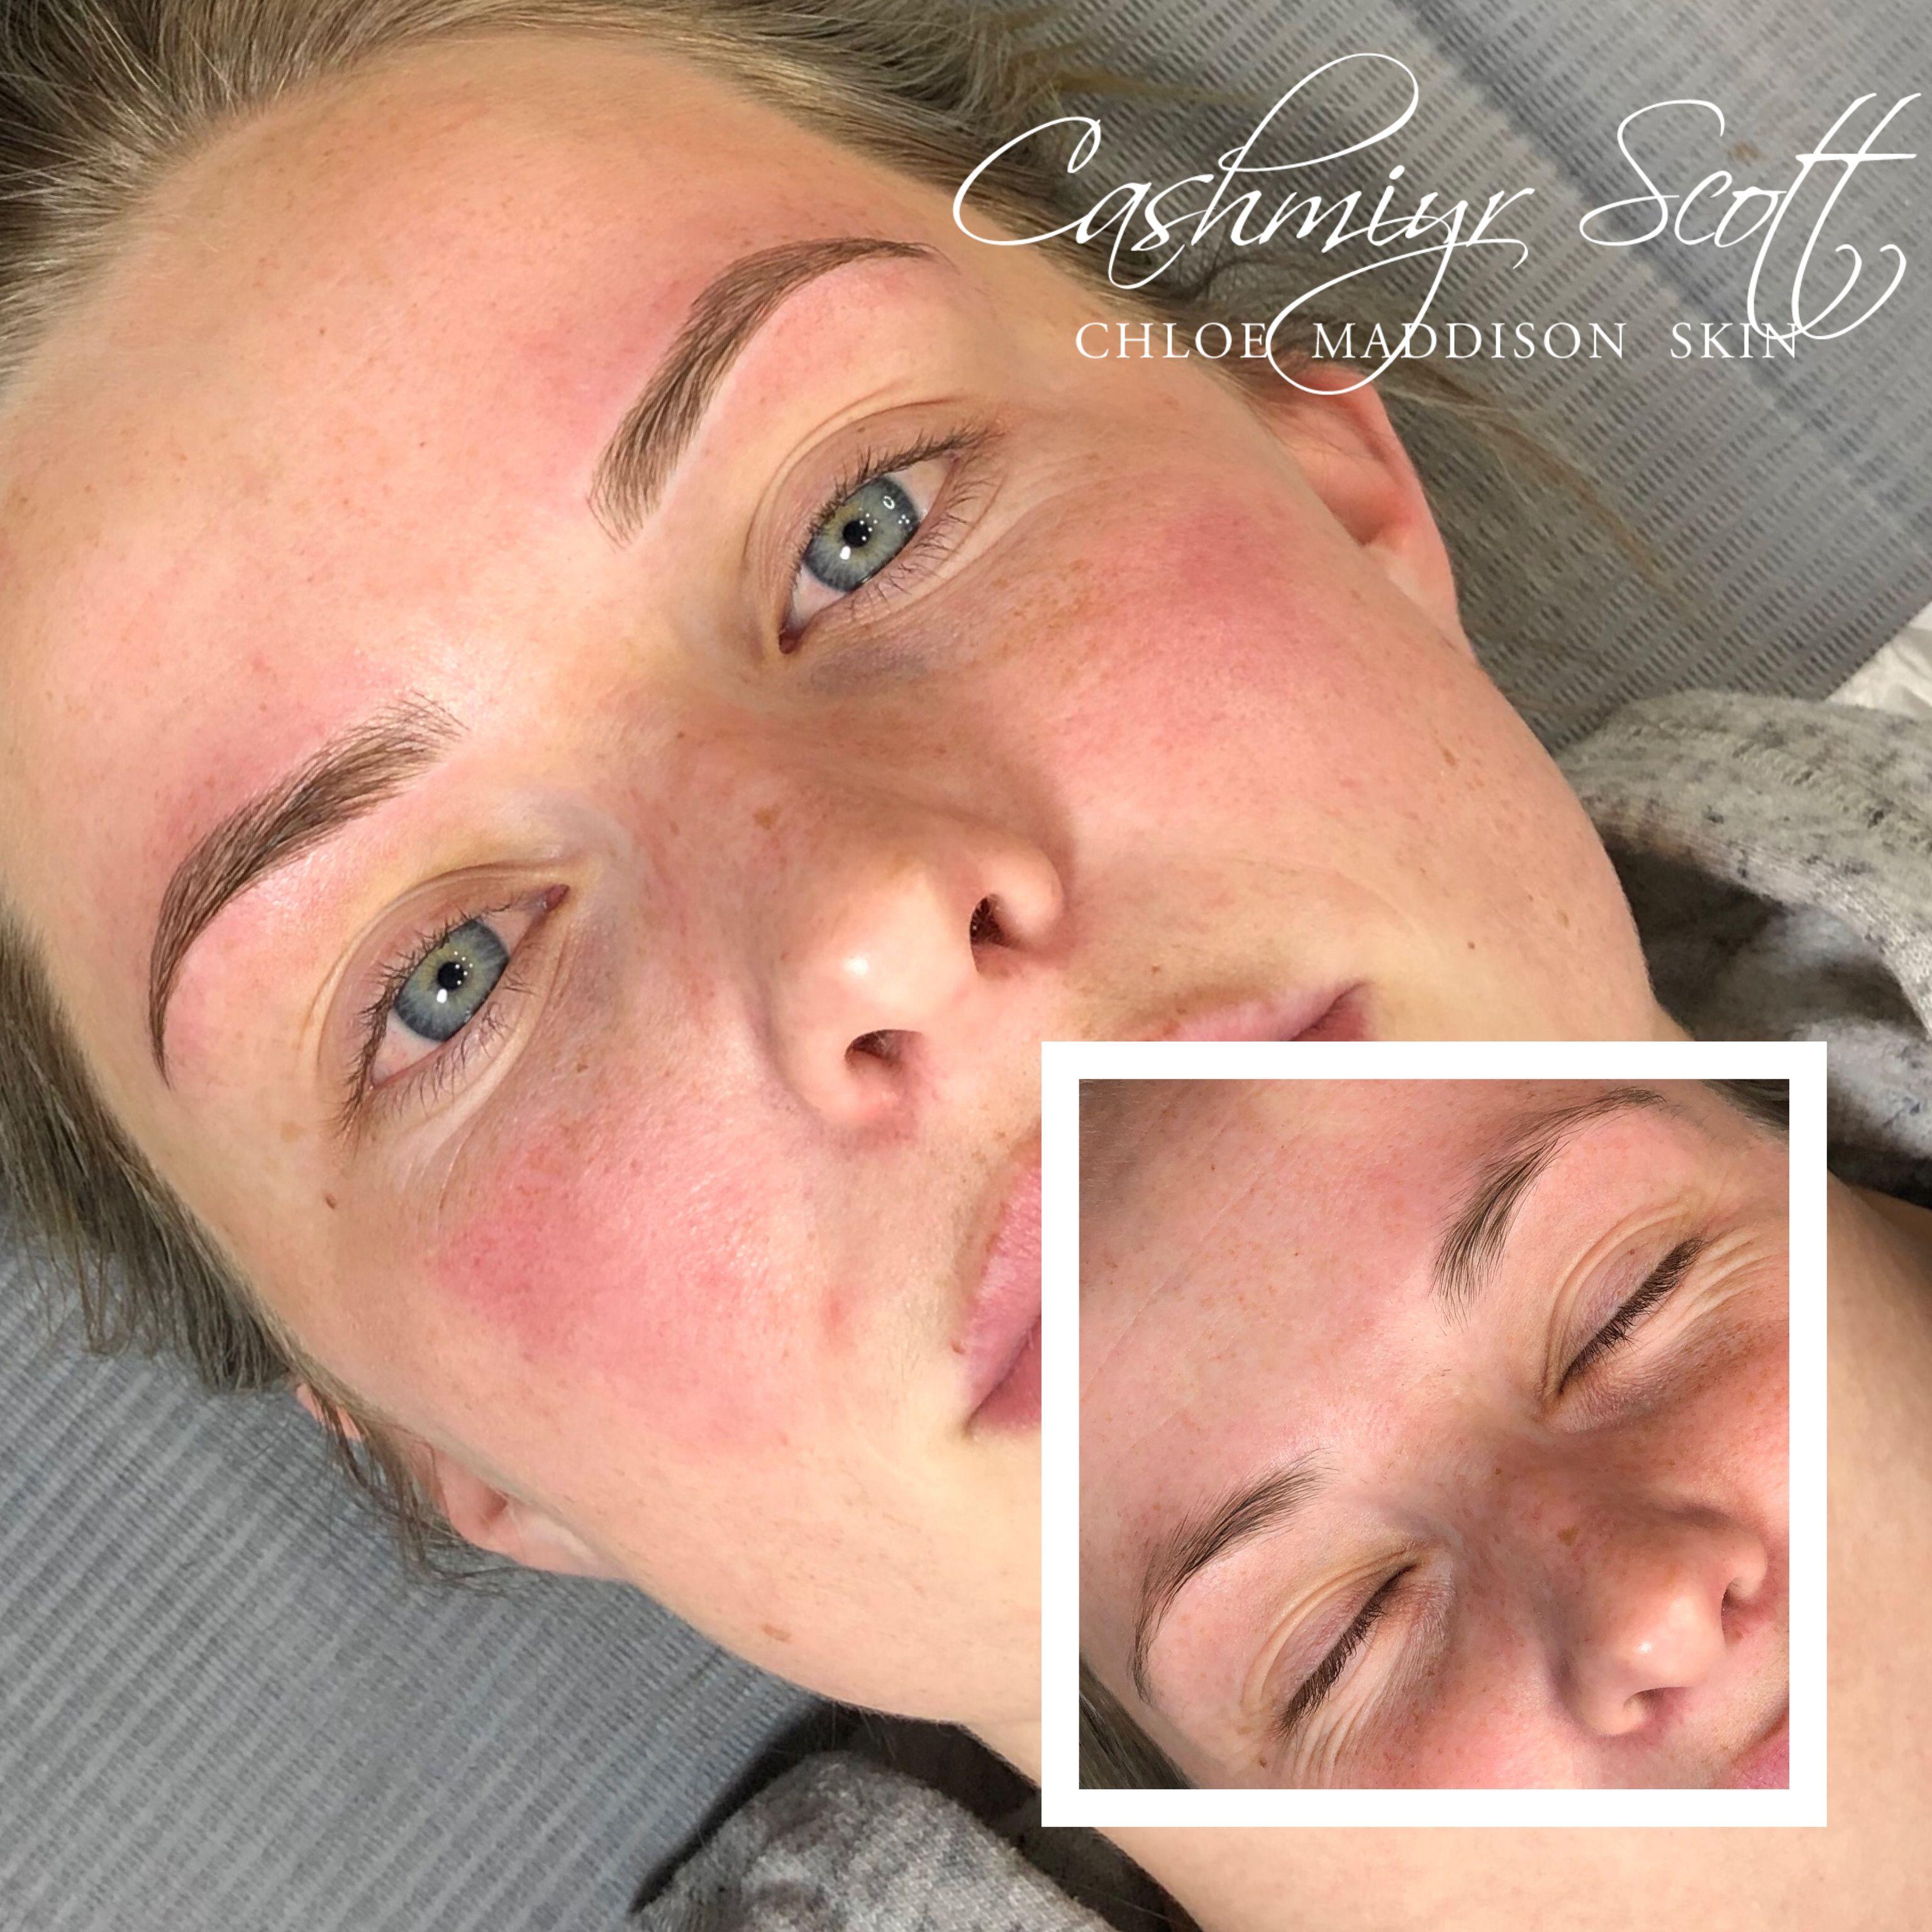 Pin by CHLOE + MADDISON SKIN on Permanent Makeup Colorado